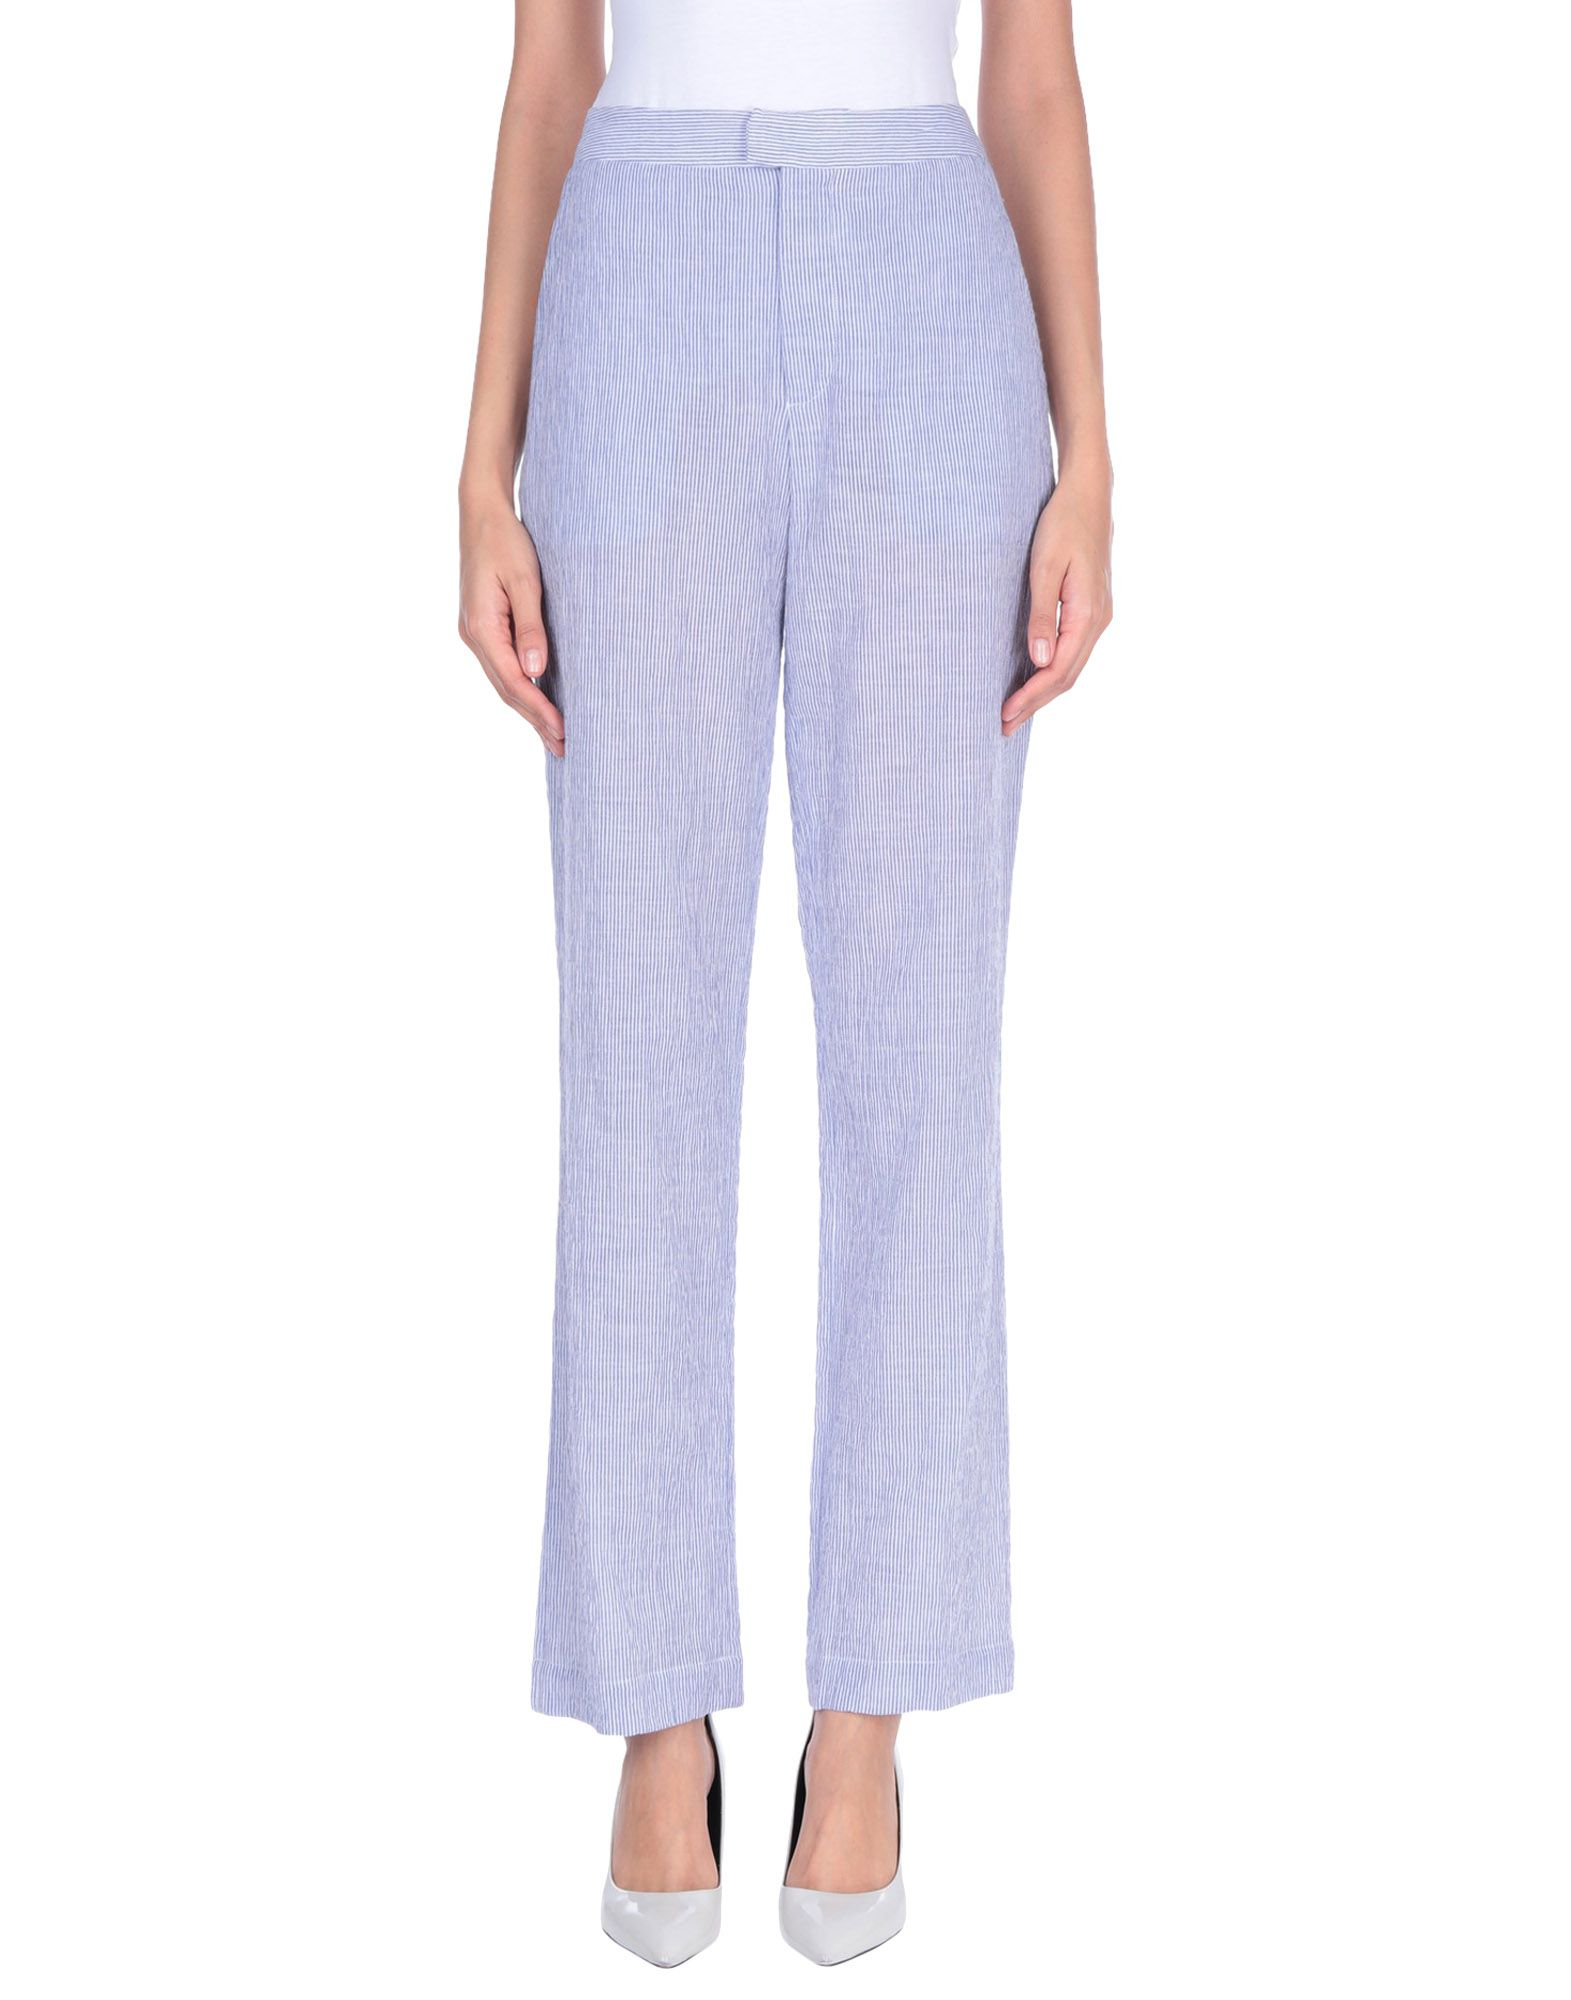 Pantalone So donna - 13288065CP 13288065CP  einzigartiges Design